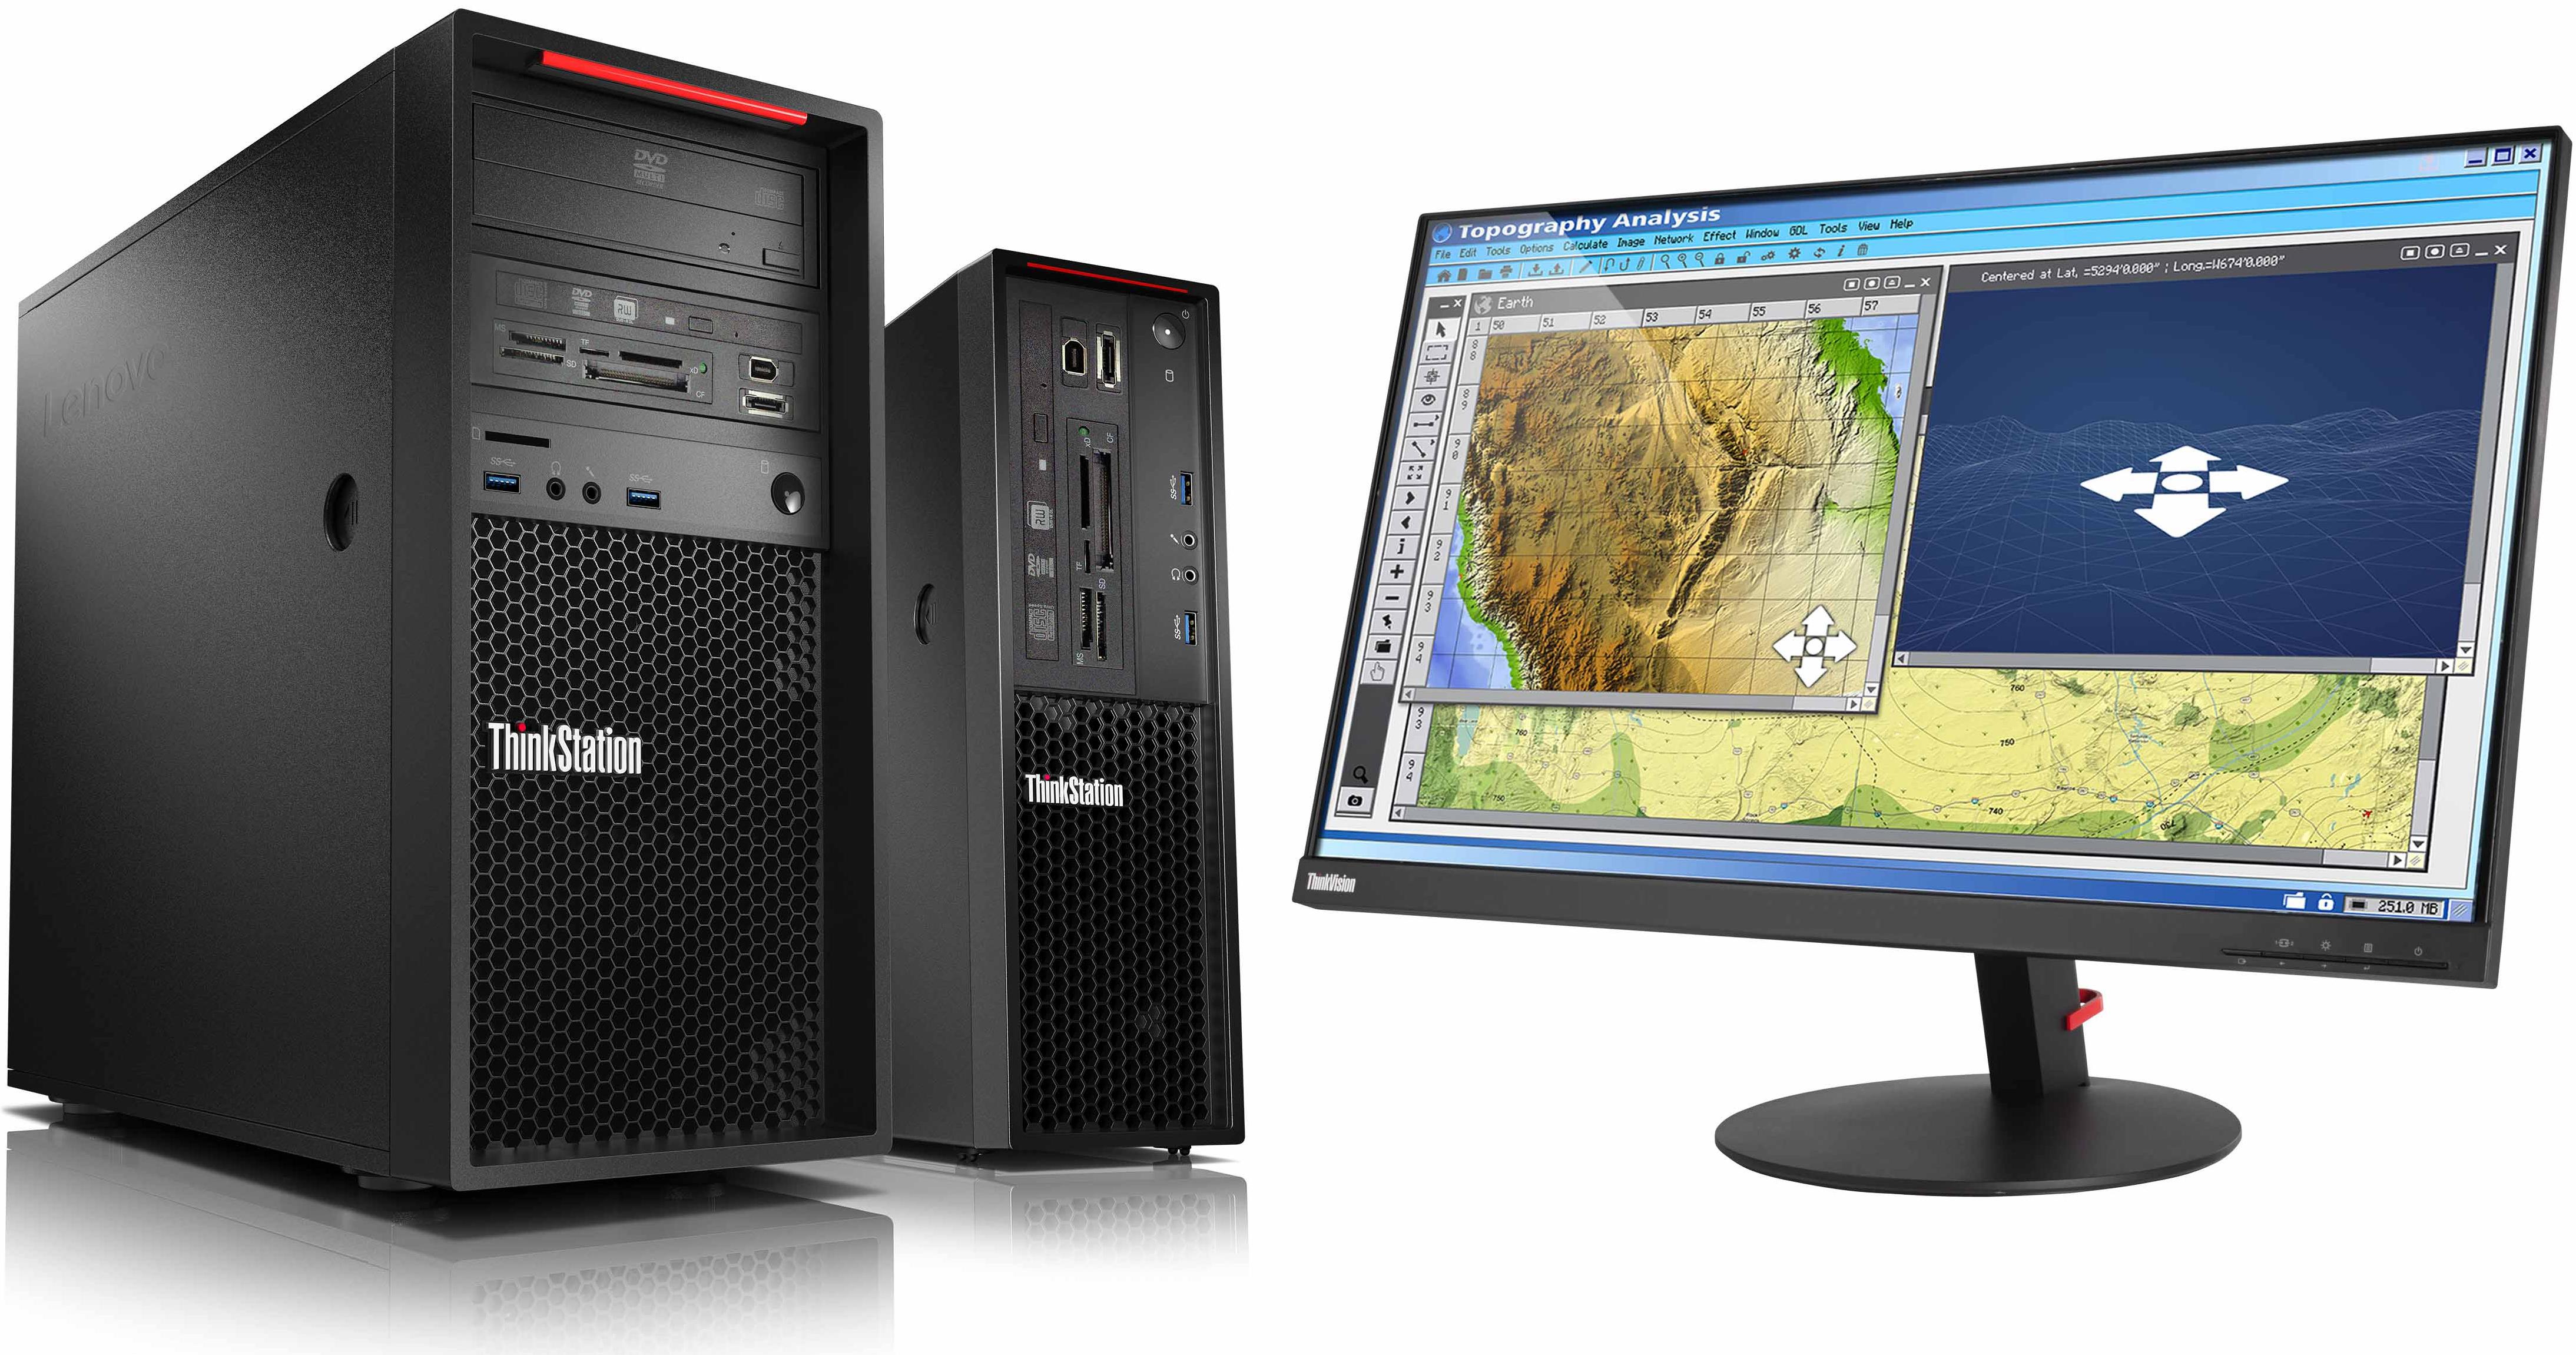 Lenovo Updates ThinkStation P320 with Intel Xeon E3 v6 and